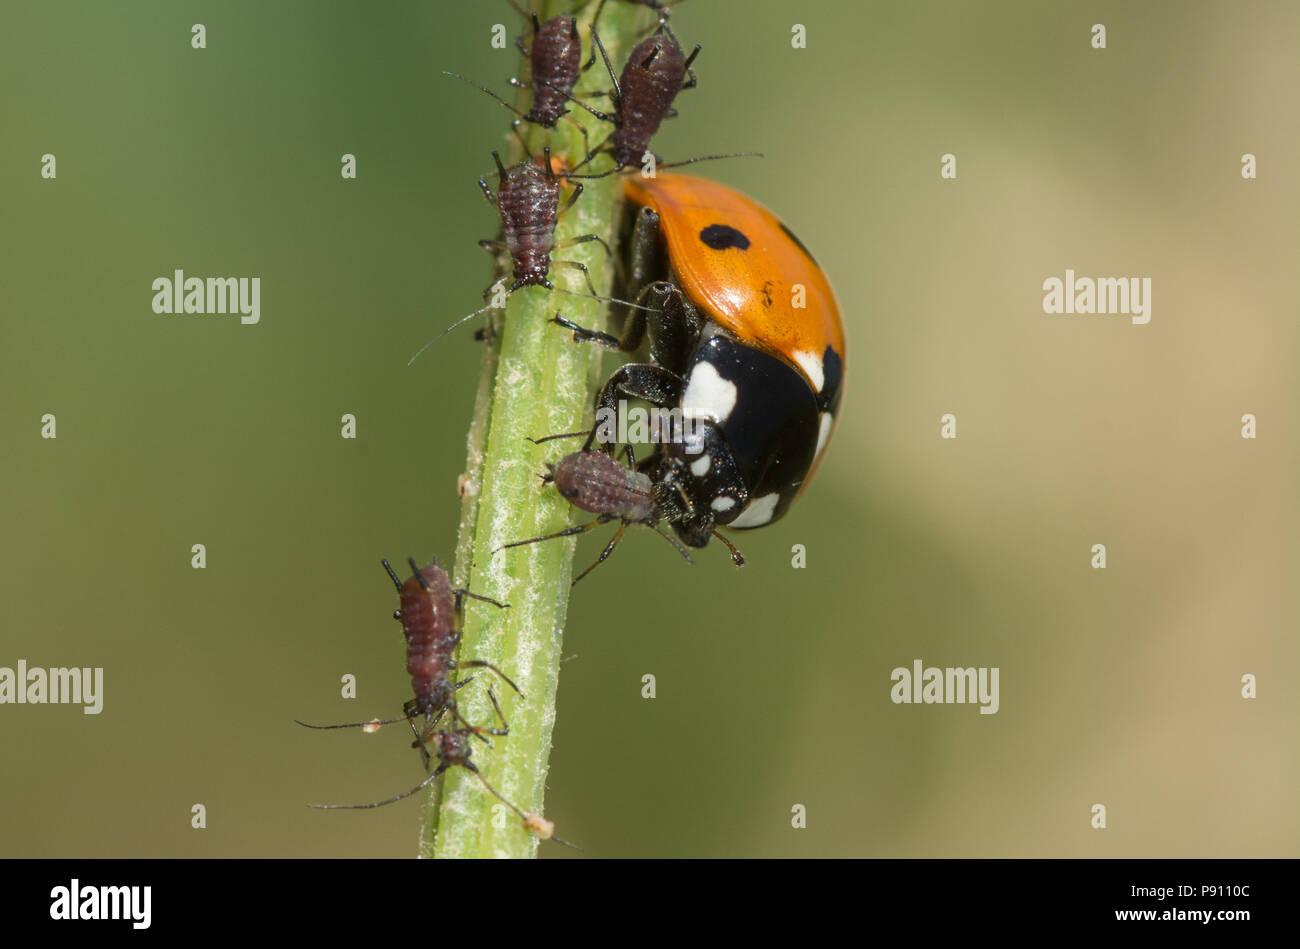 seven-spot-ladybird-coccinella-septempunctata-feeding-on-an-aphid-on-a-plant-stem-P9110C.jpg